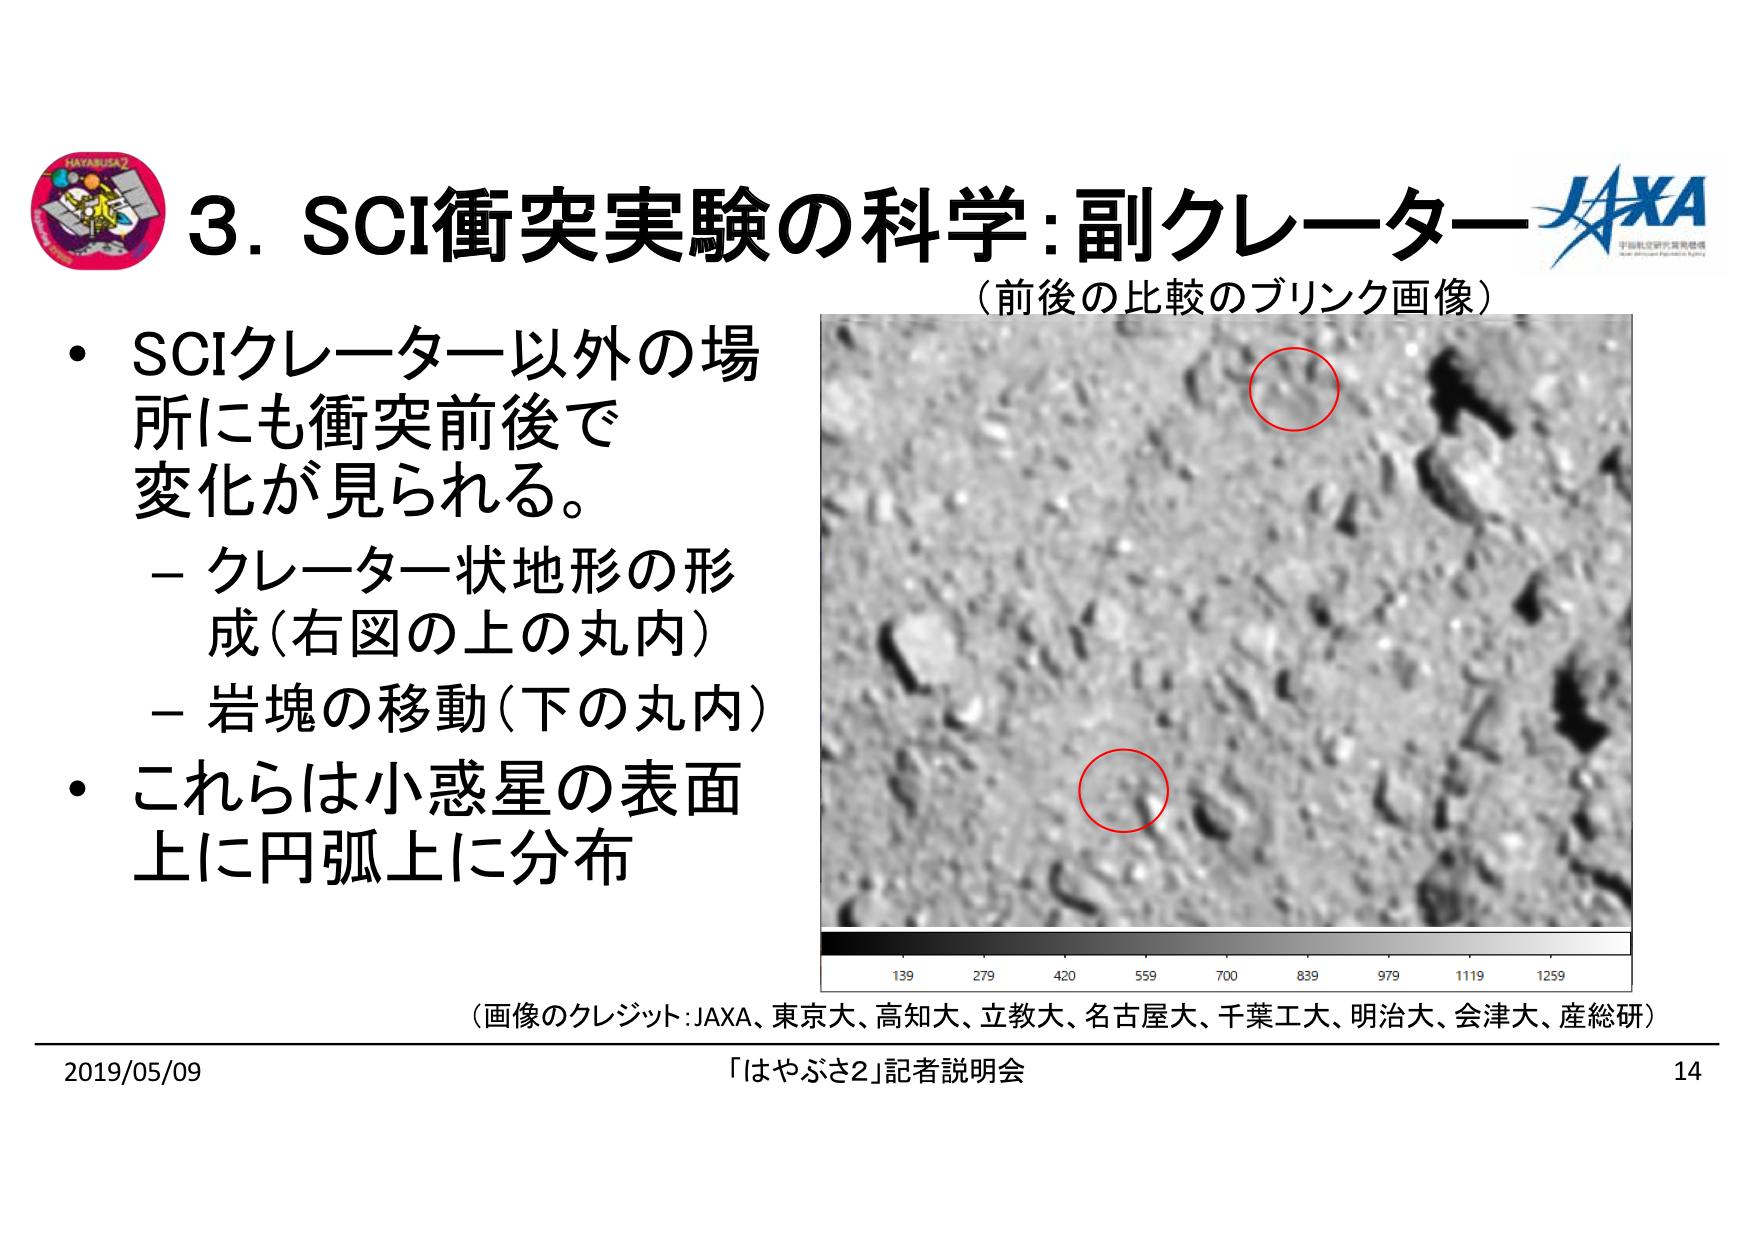 f:id:Imamura:20190509154410p:plain